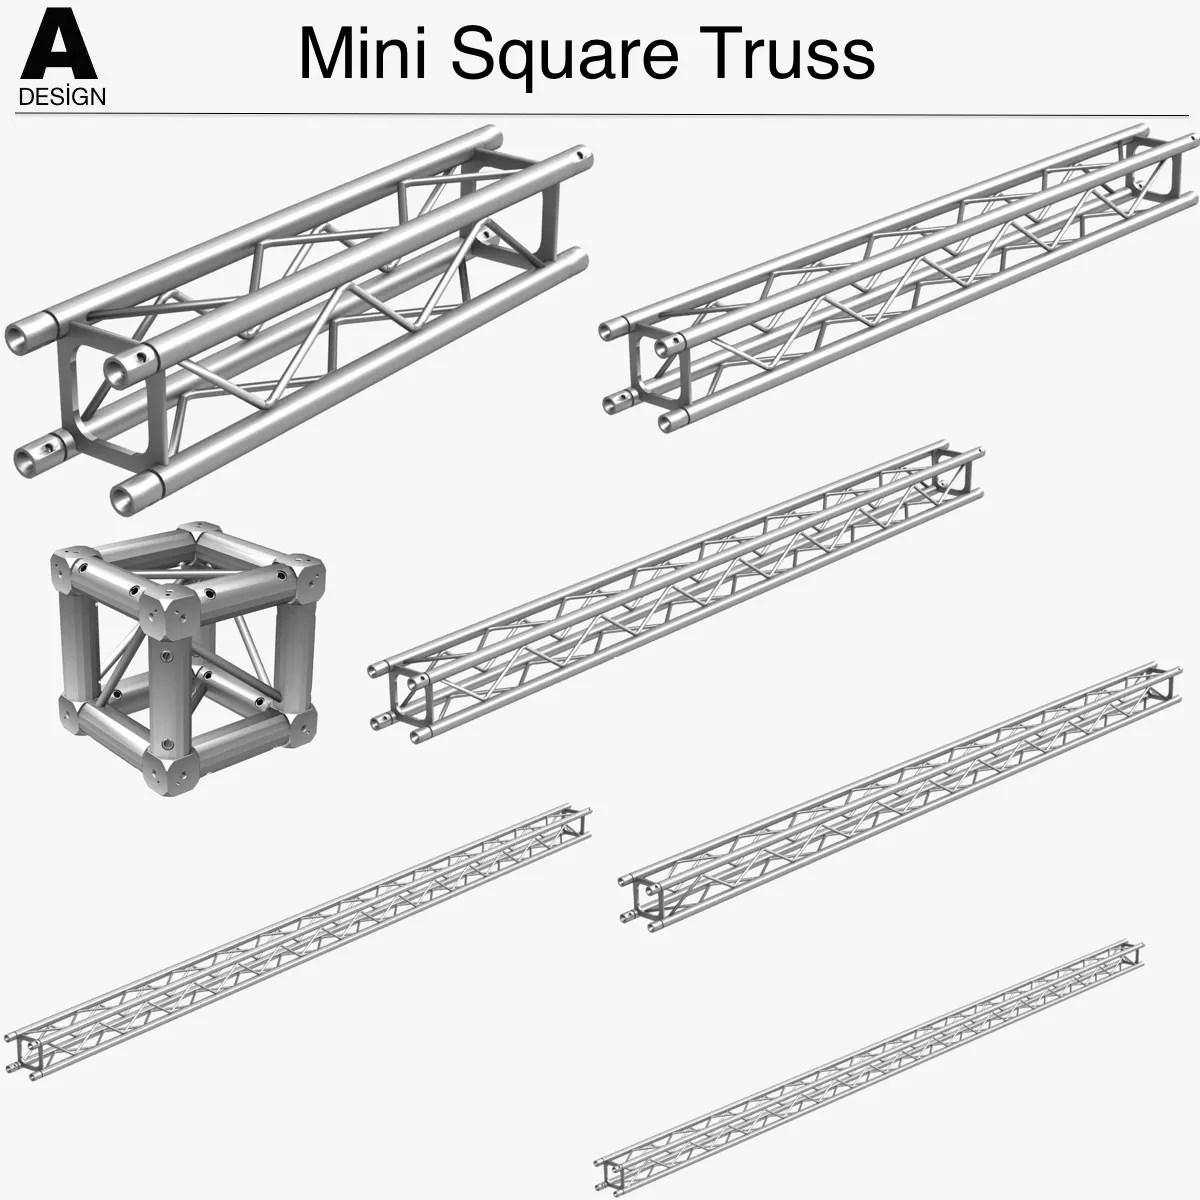 Mini Square Truss Collection 7 Modular Pieces 3d Model